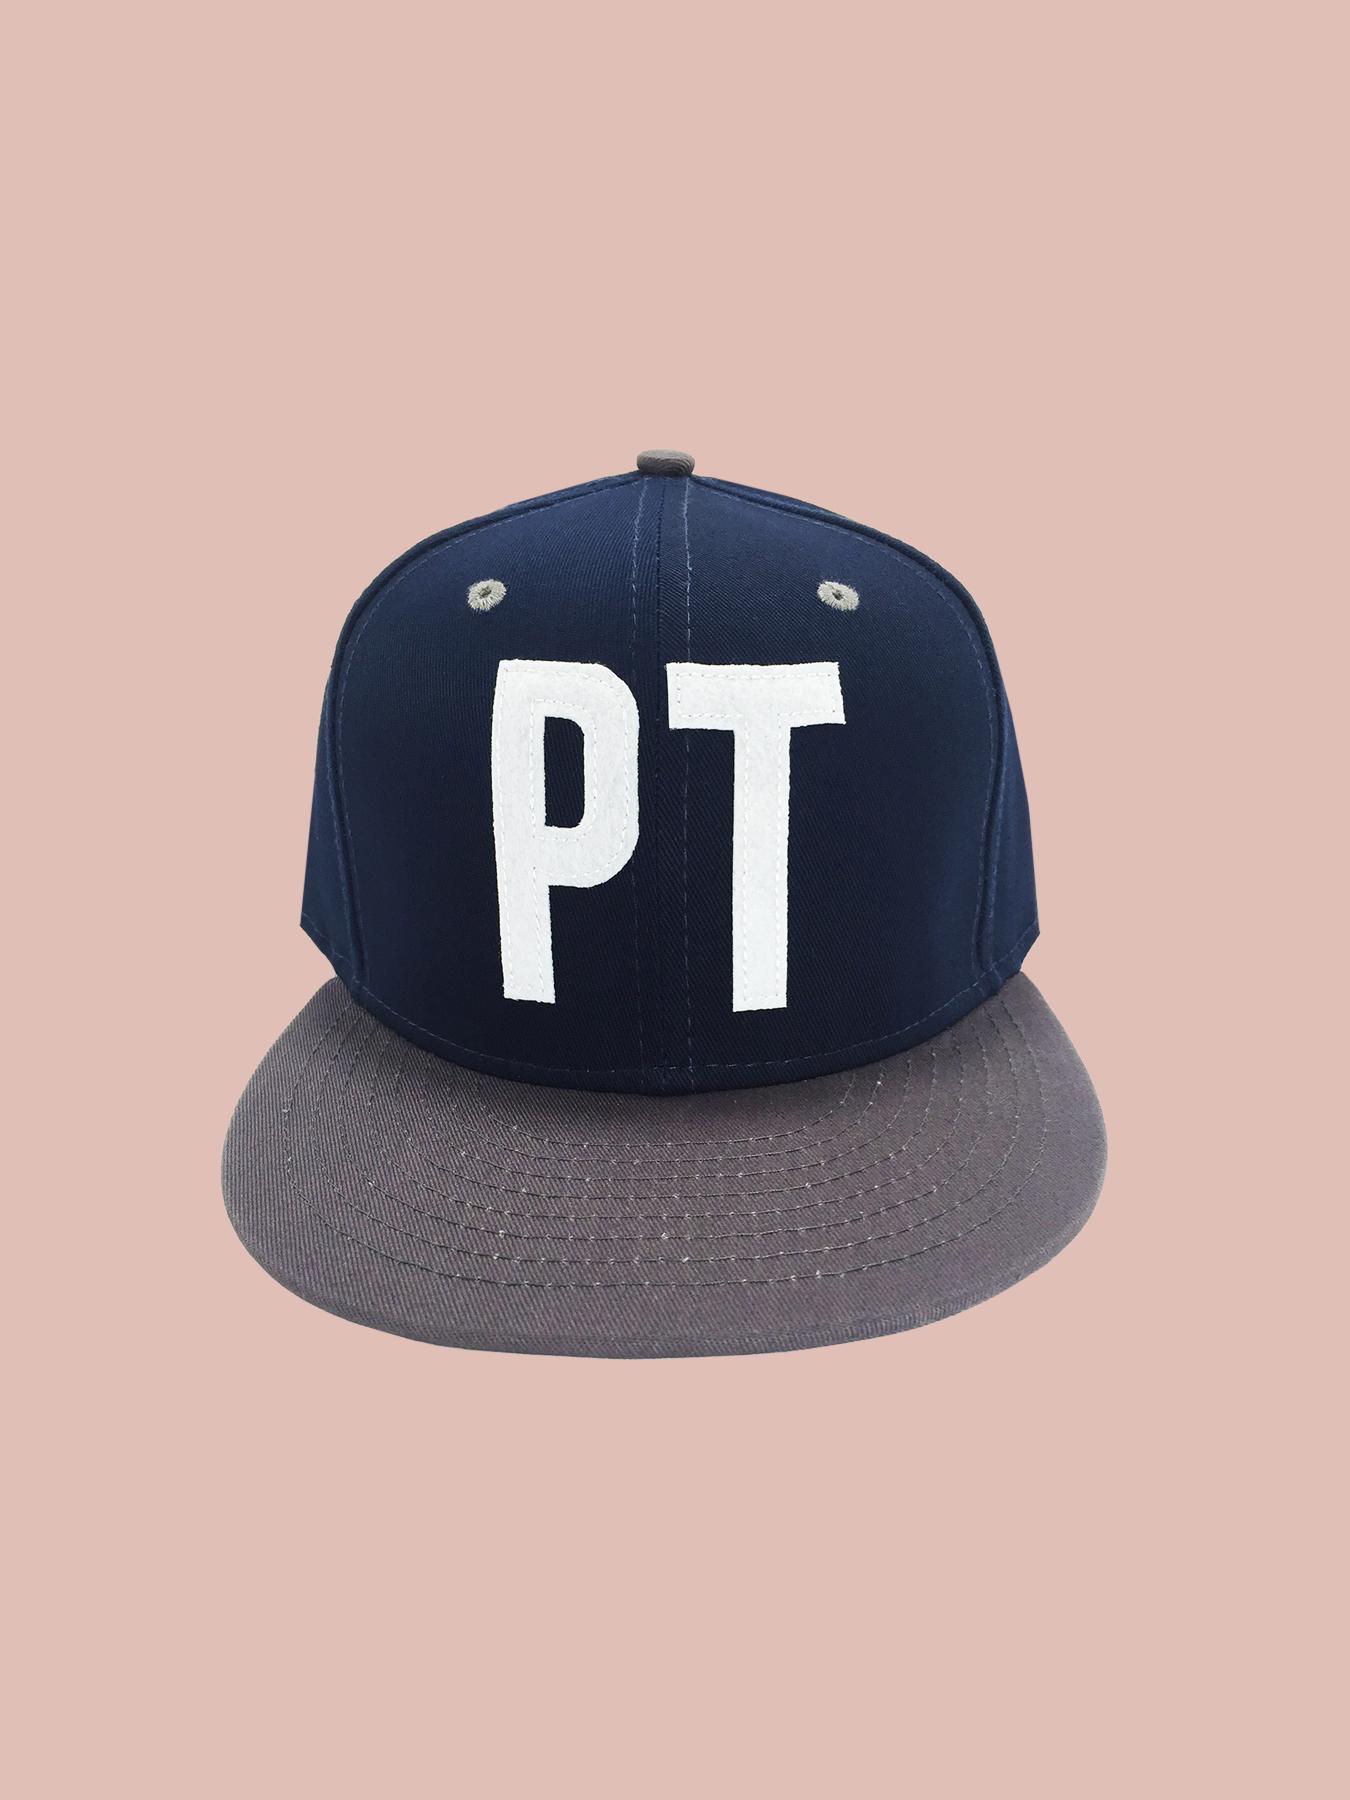 BASEBALL HAT: Navy Ptown Hat